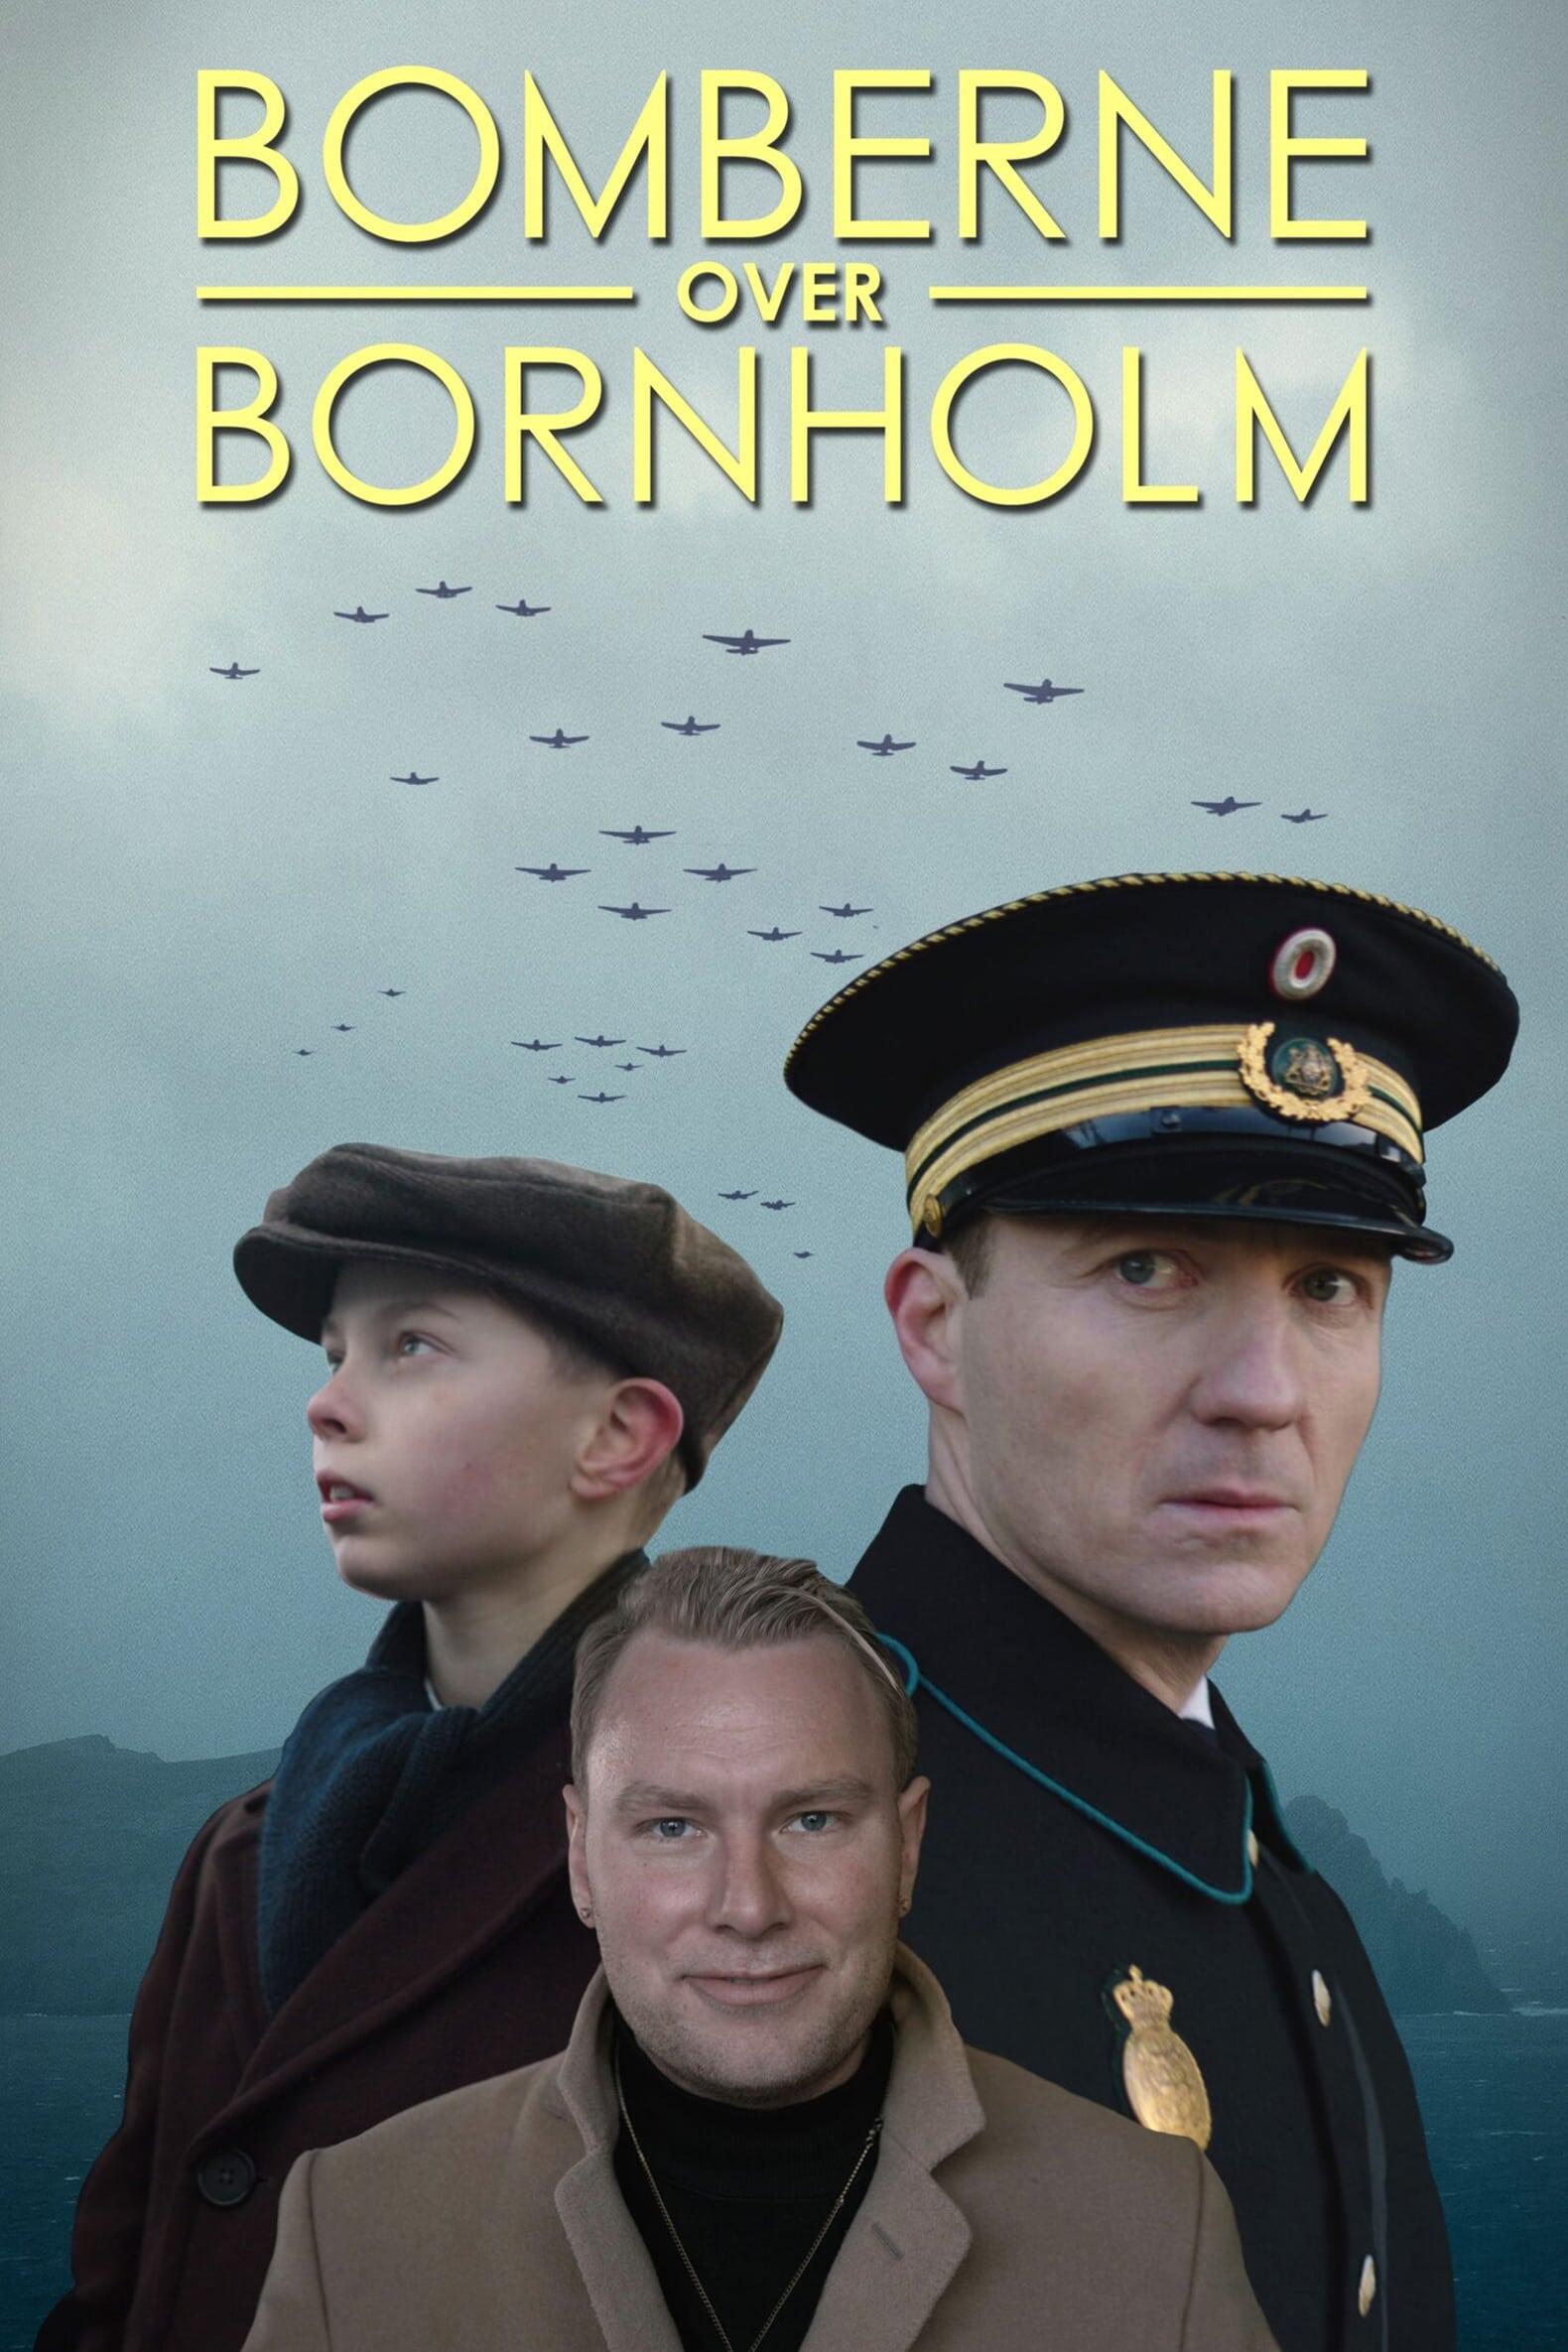 Bomberne over Bornholm